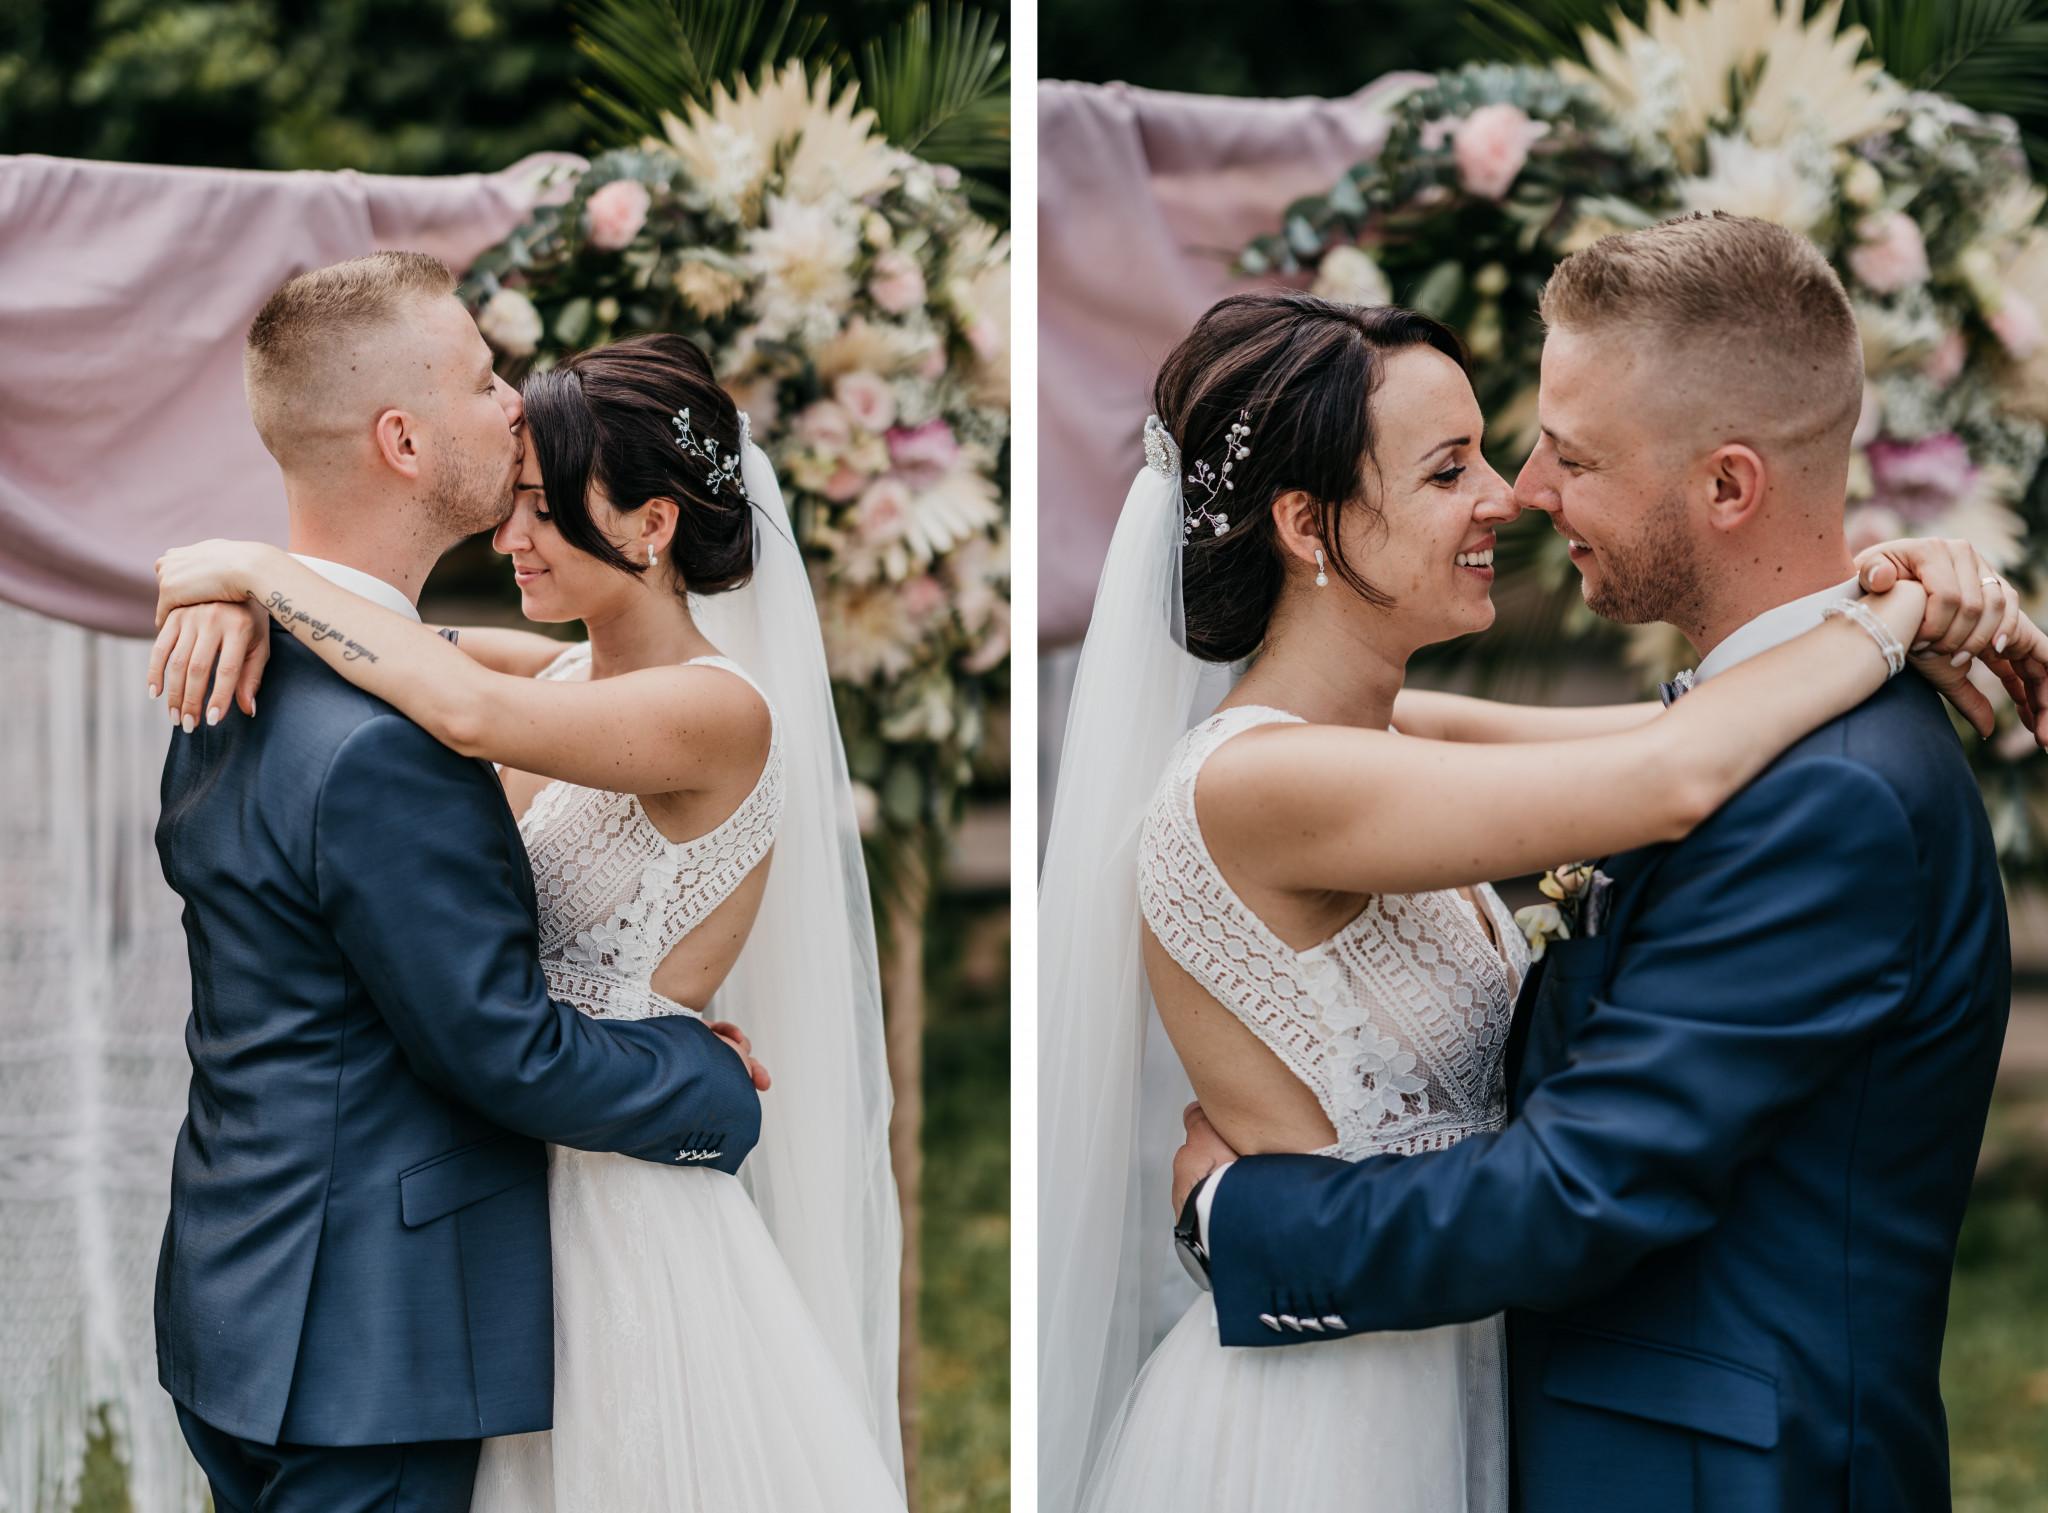 Brautpaar-Shooting